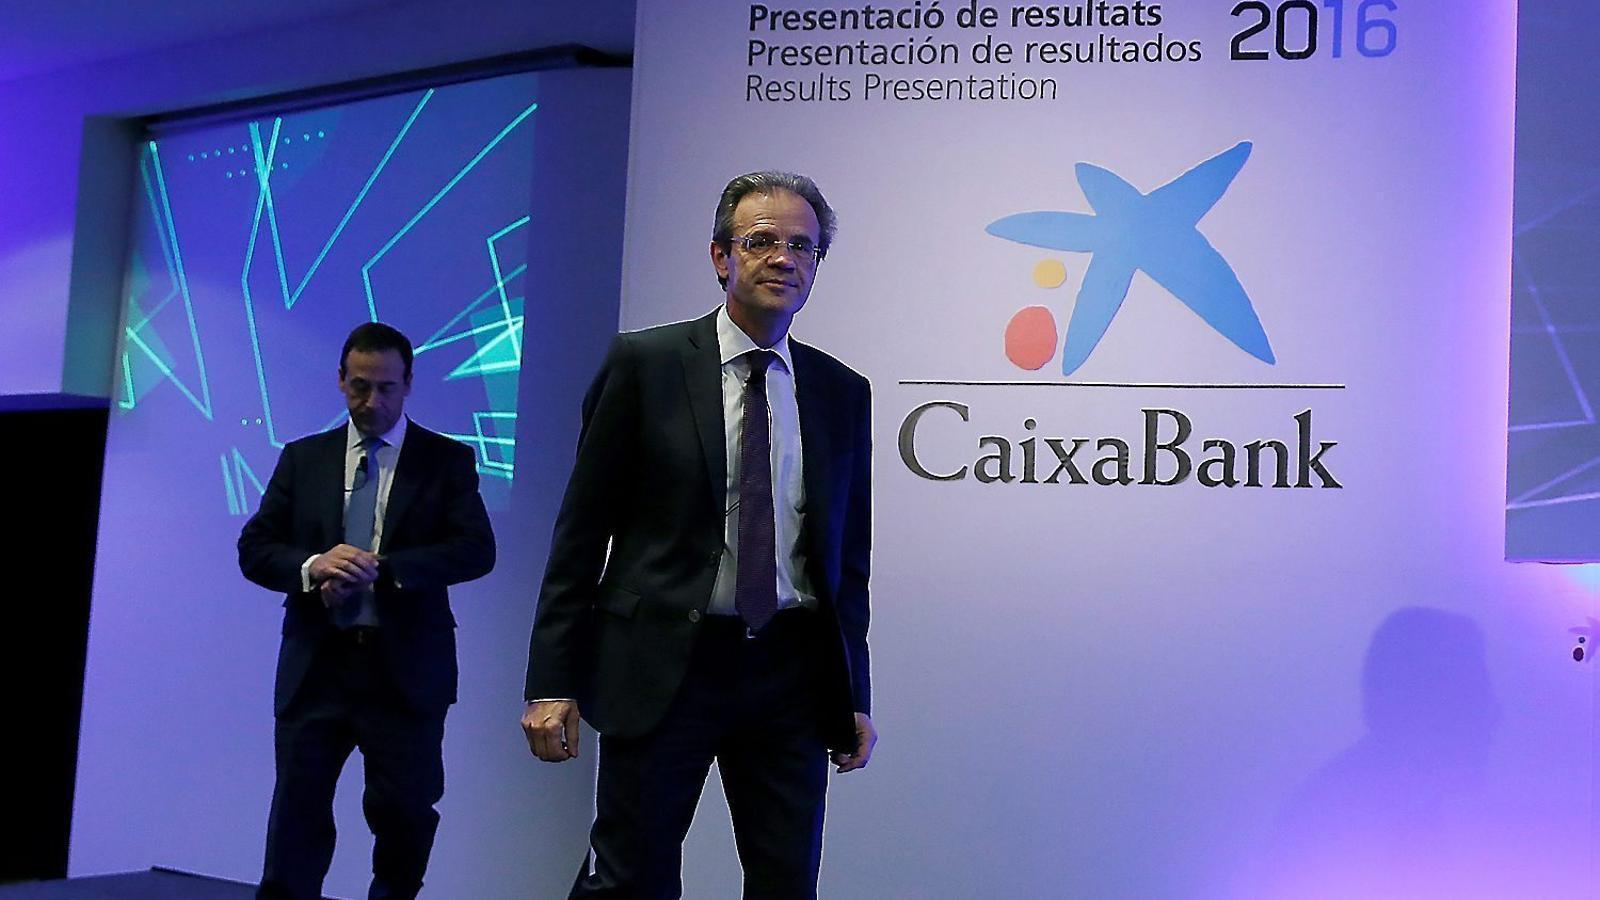 En primer pla, Jordi Gual, president de CaixaBank, seguit de Gonzalo Gortázar, conseller delegat.